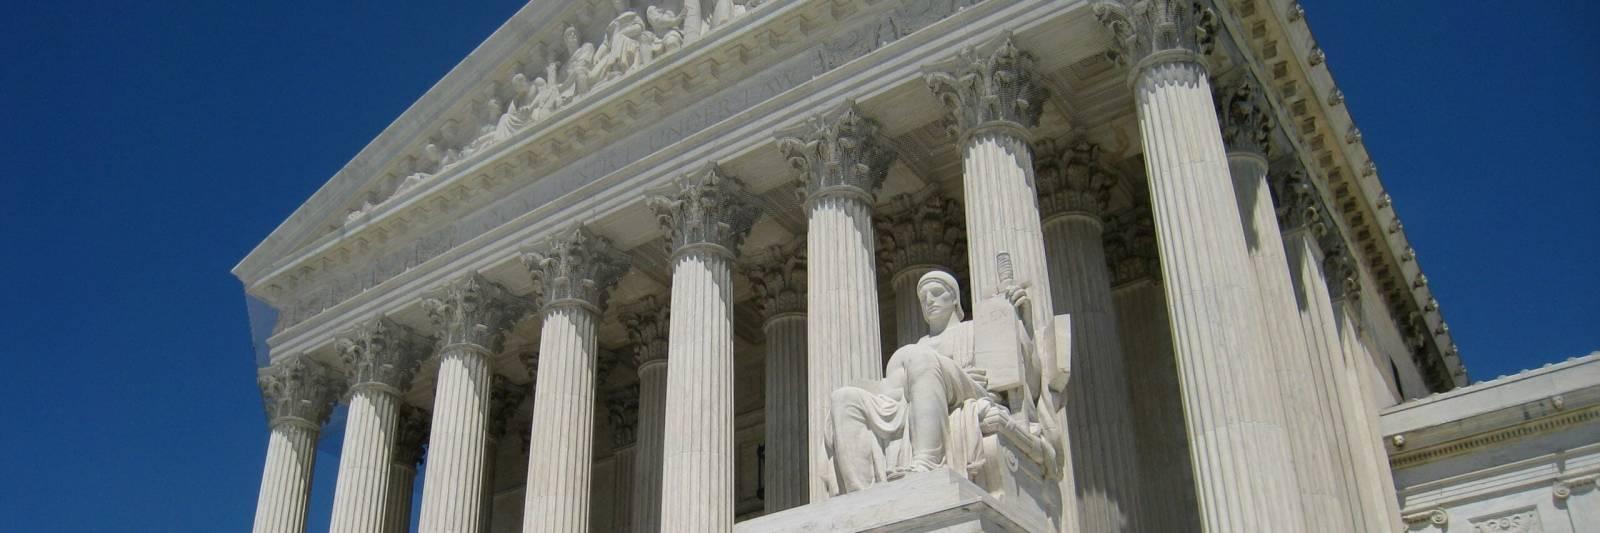 supreme court narrows interpretation of cfaa, to the relief of